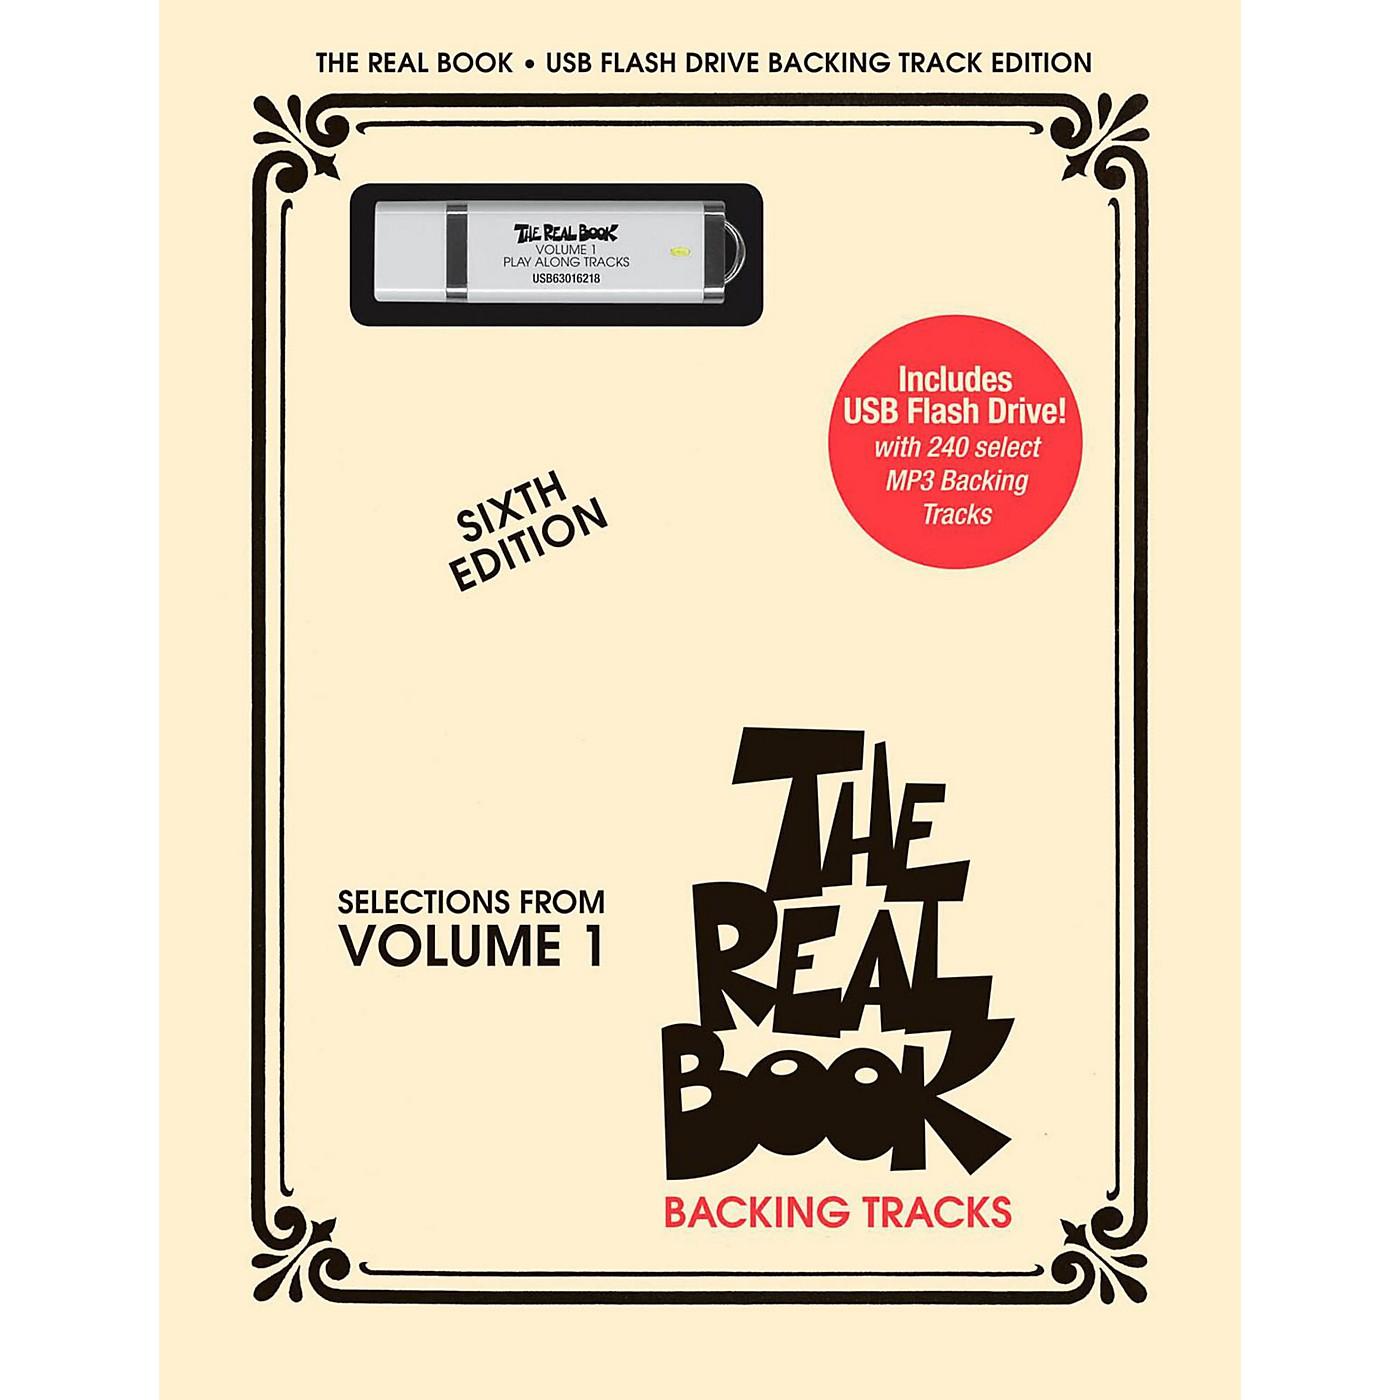 Hal Leonard The Real Book Backing Tracks, Volume 1 (USB Flash Drive) thumbnail